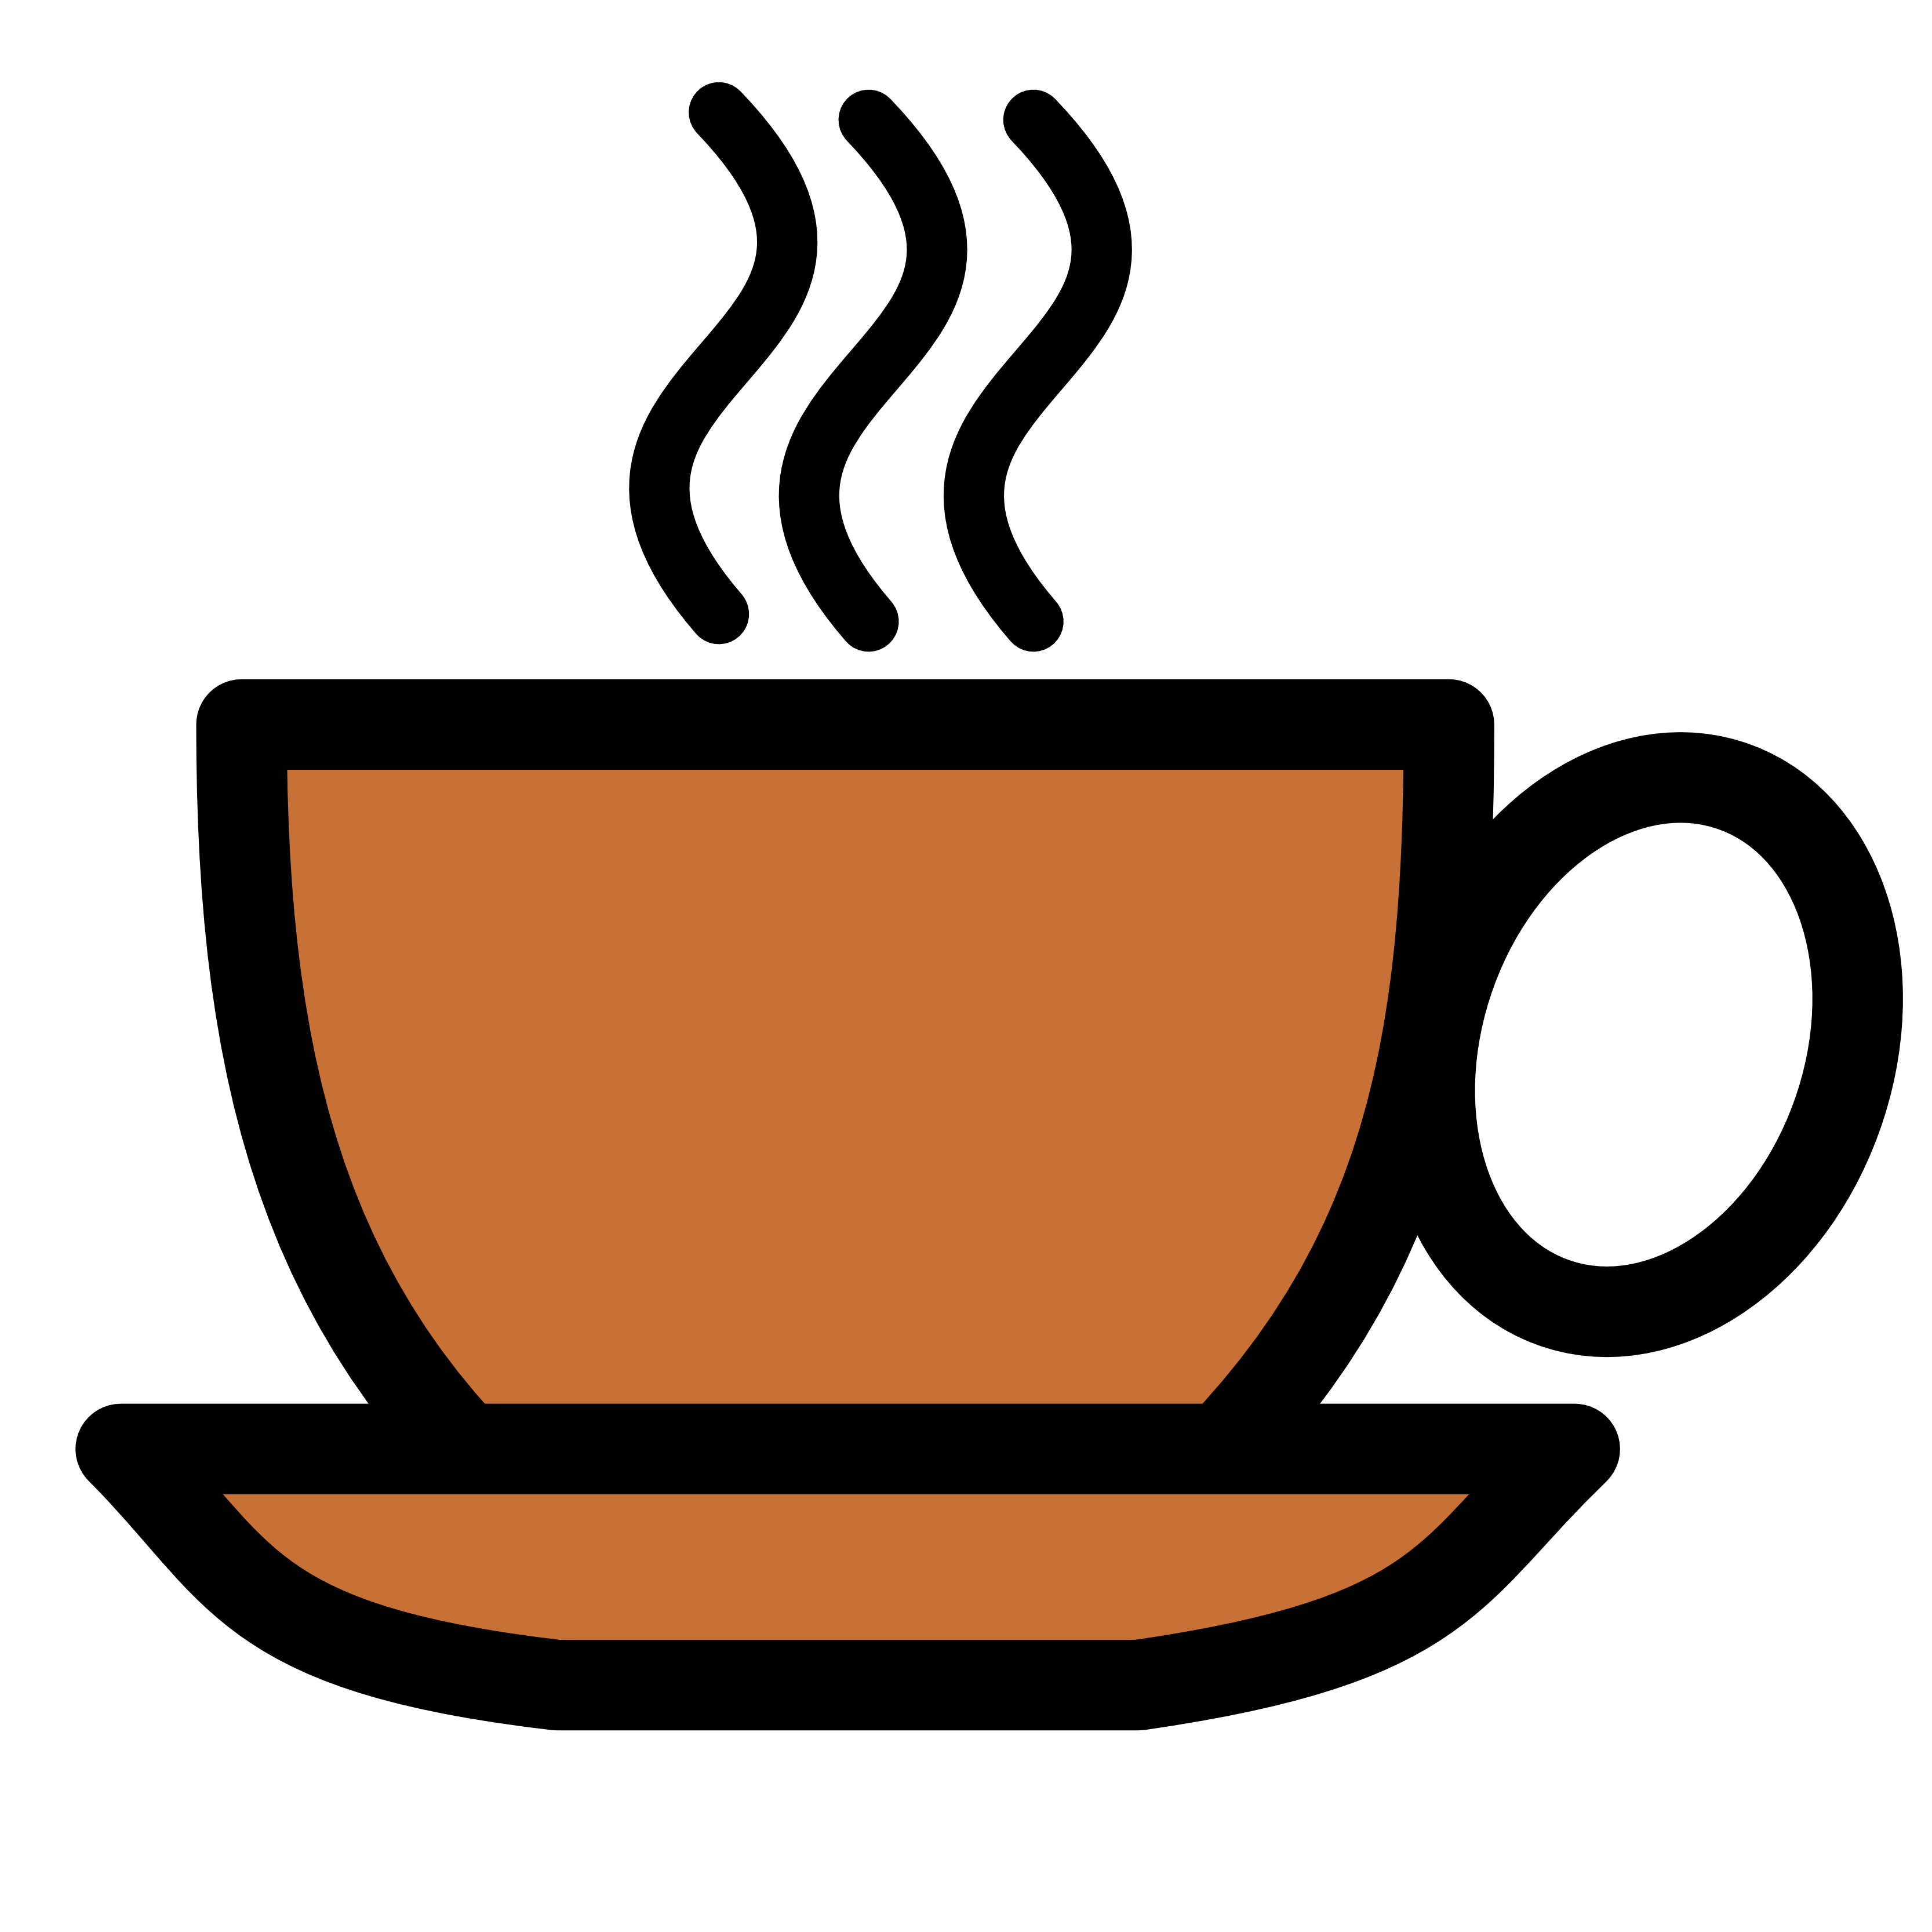 coffee can clip art - photo #1